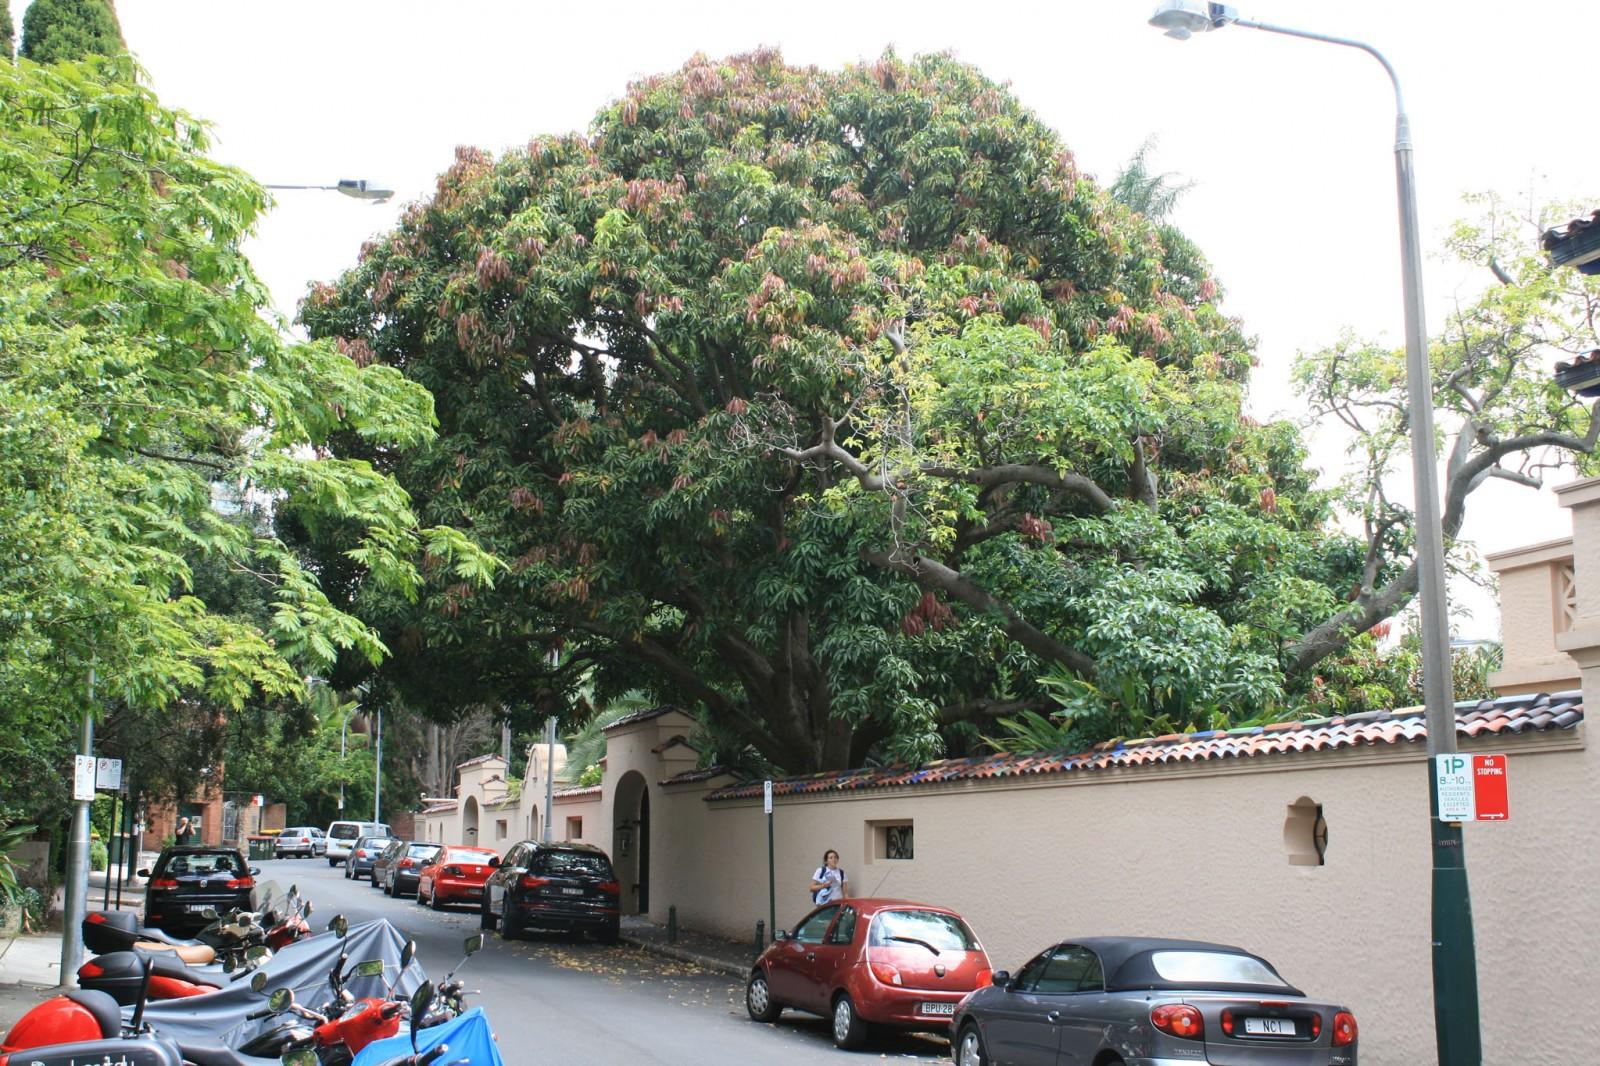 A large Mango Tree (Mangifera indica) located adjacent to